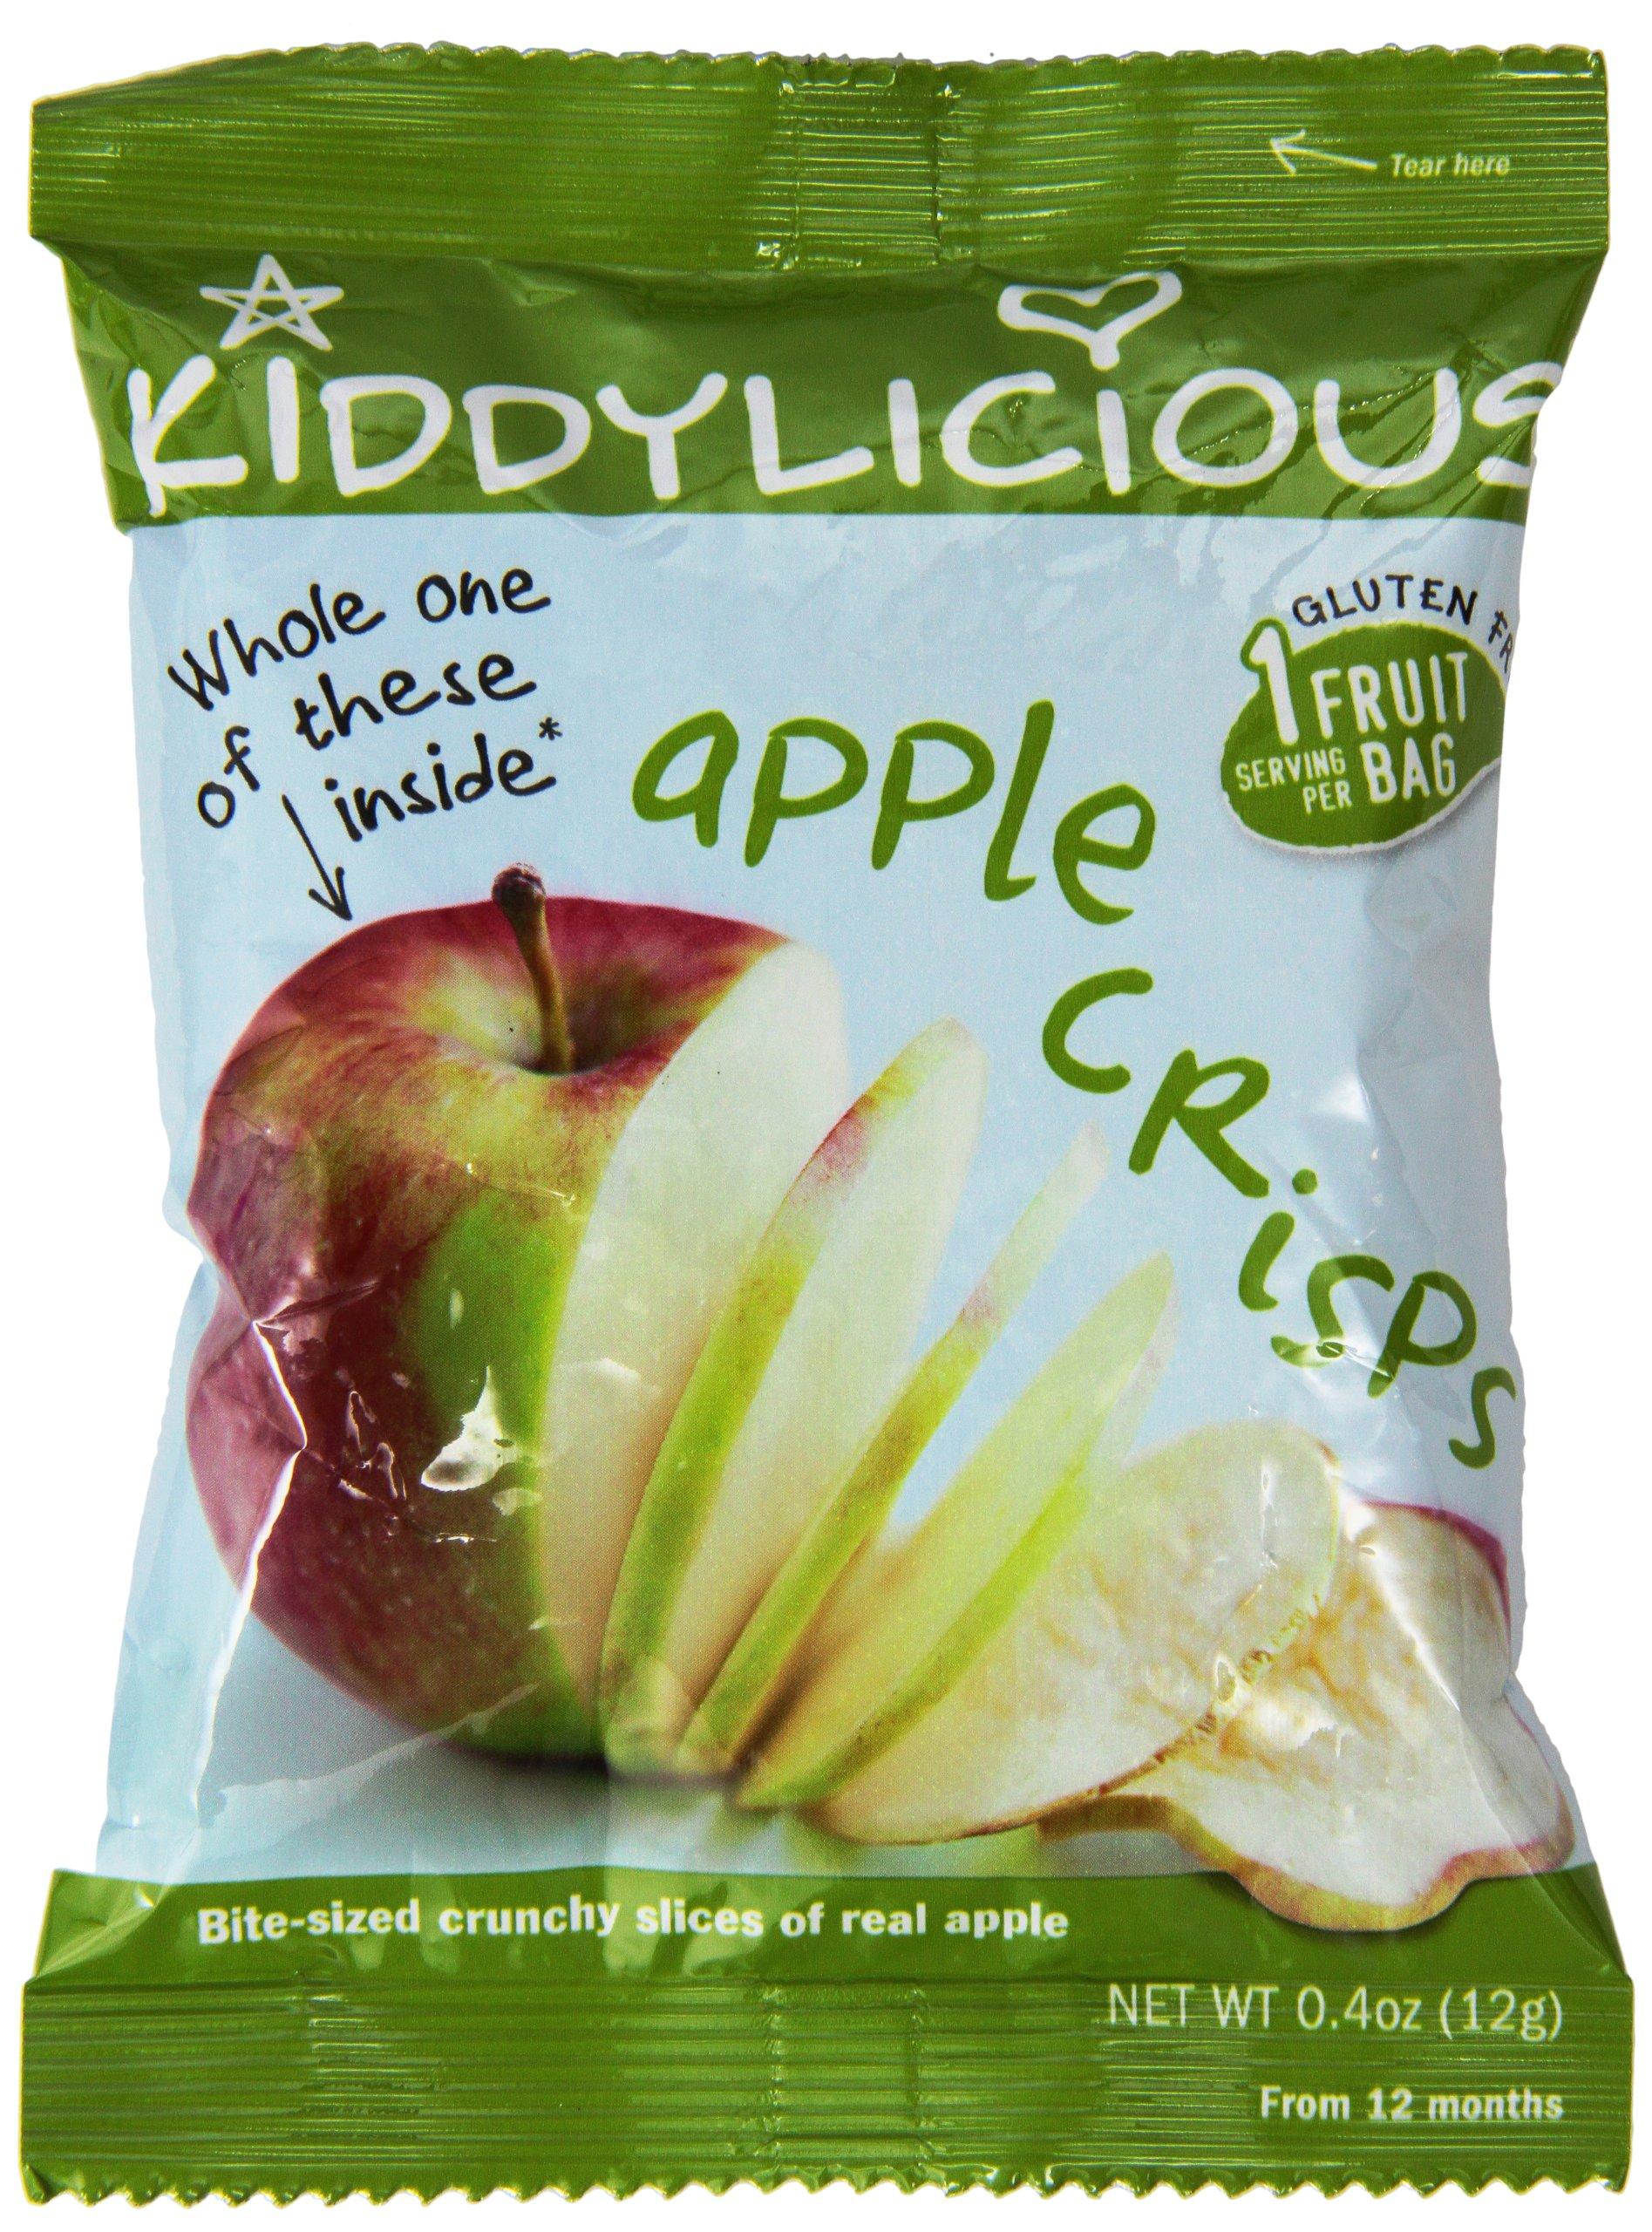 Kiddylicious, Apple Crisps, 10.2 oz (24 bags) by Kiddylicious